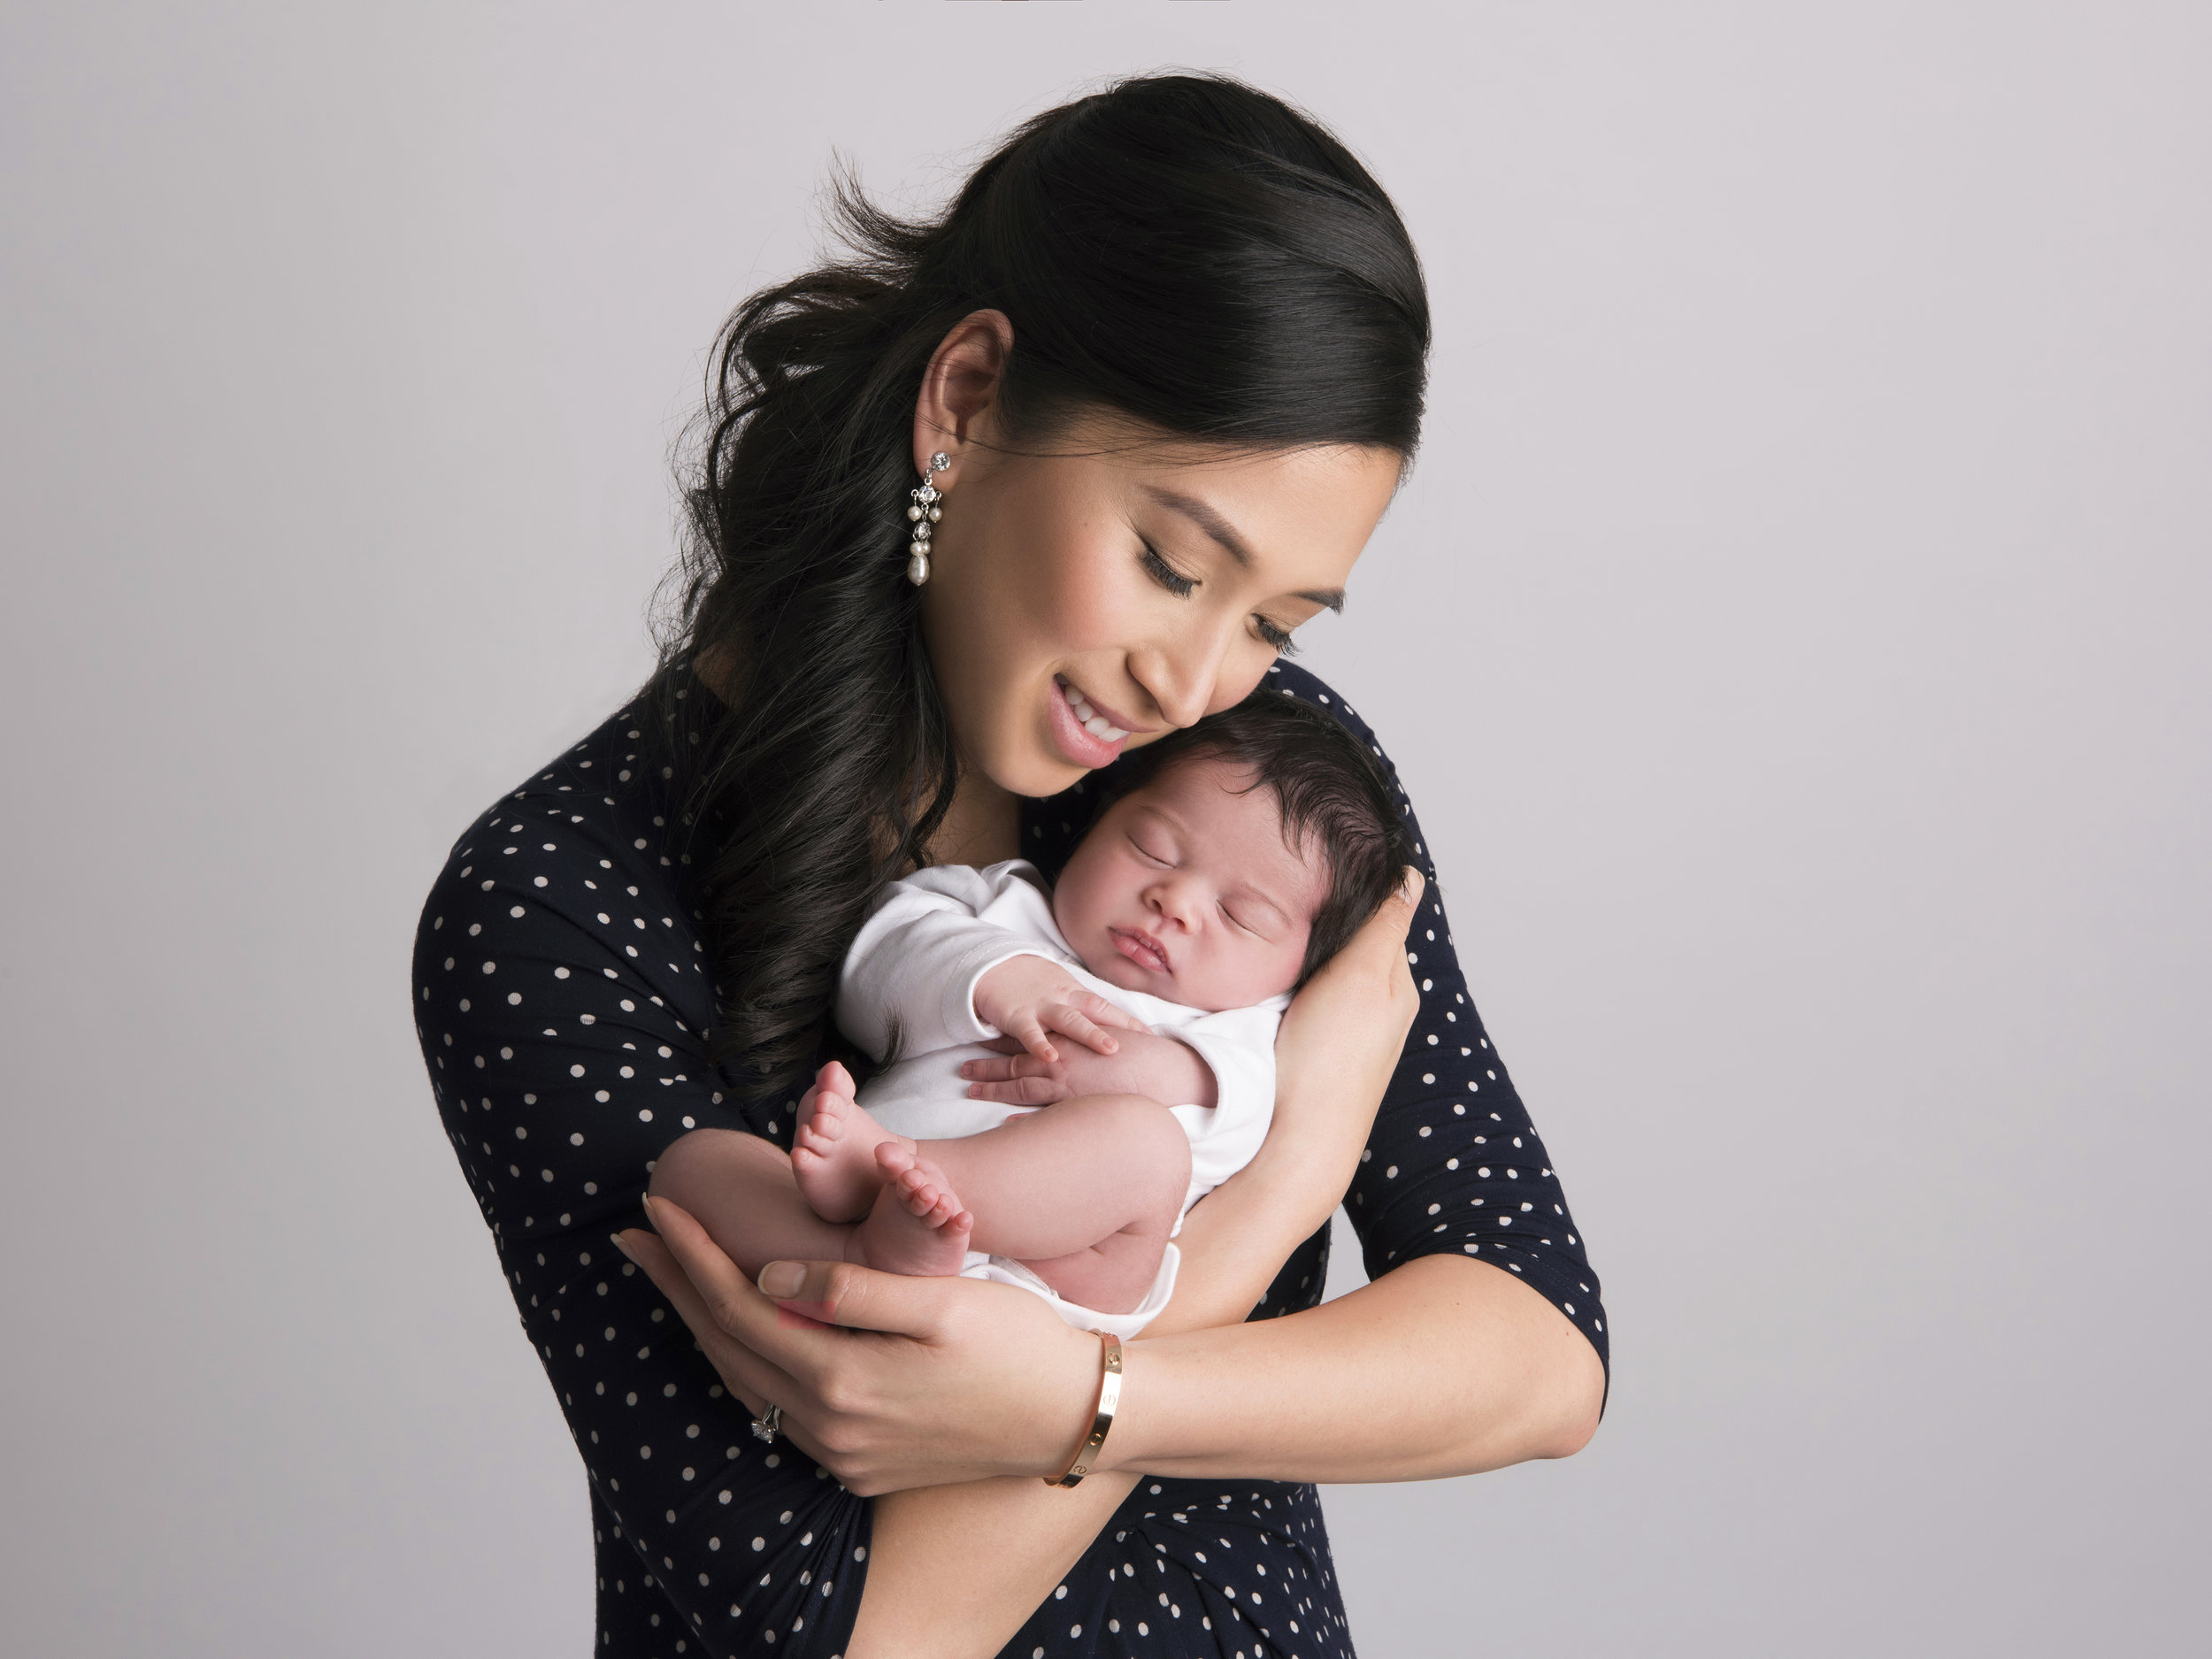 newborn-photography-Central-London.jpg